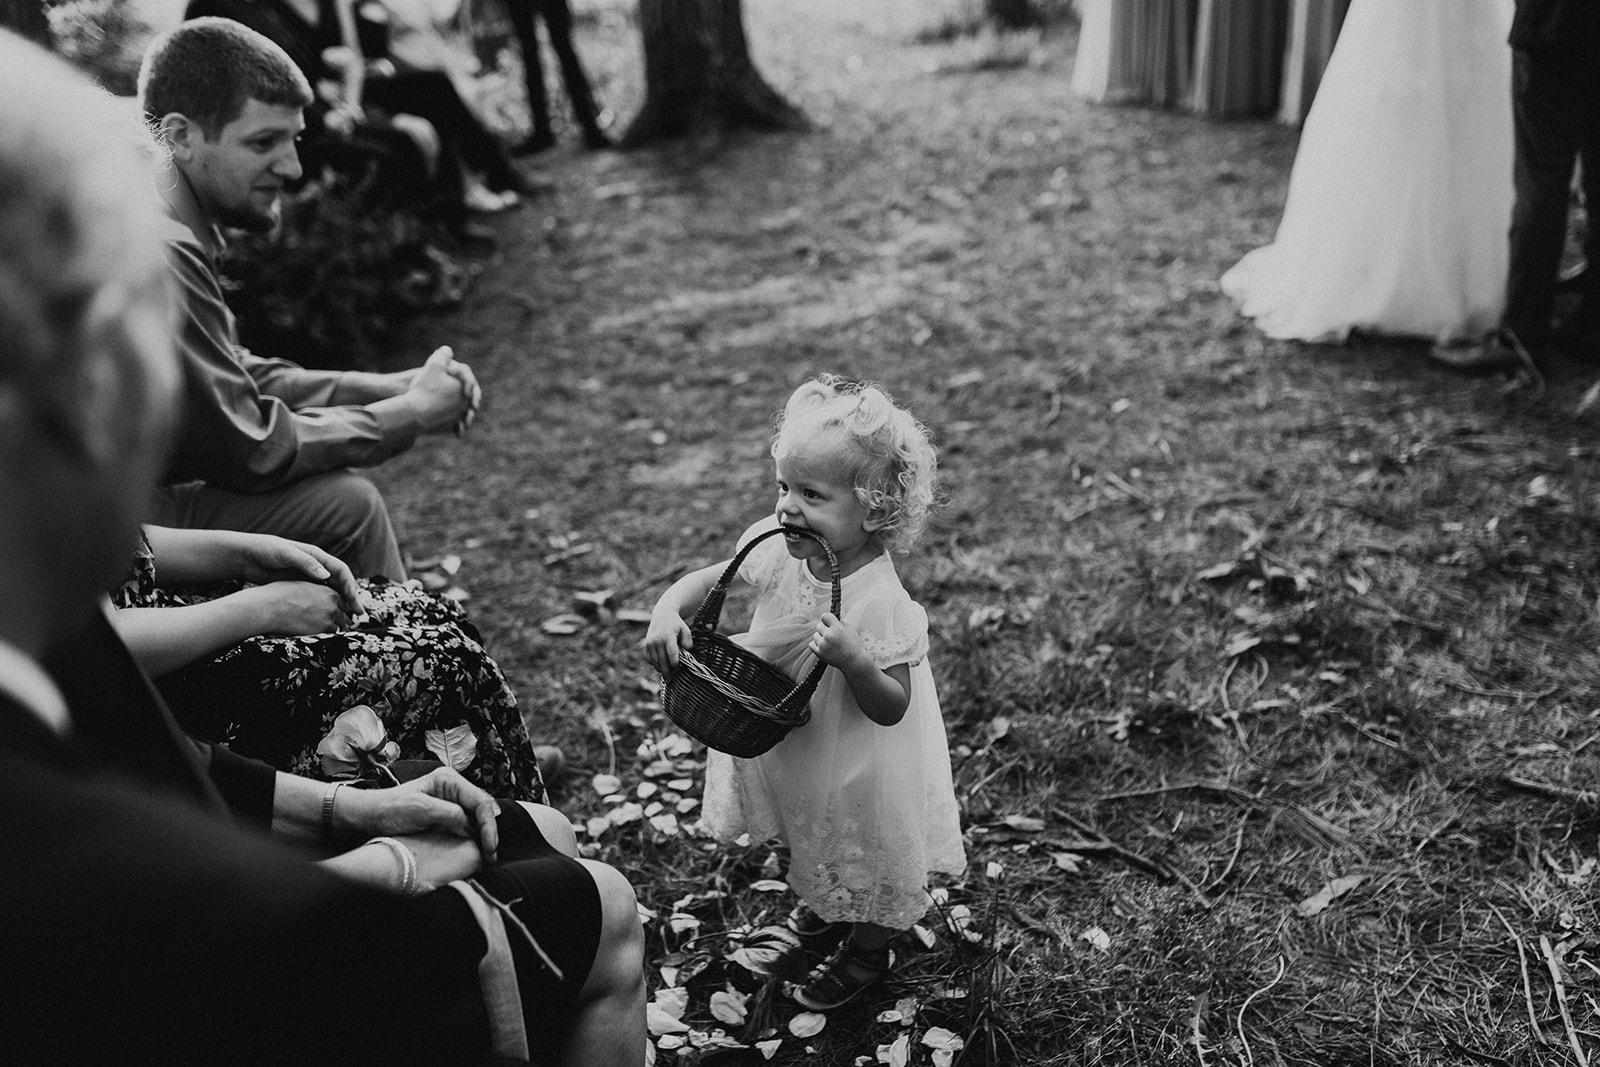 camp_wokanda_peoria_illinois_wedding_photographer_wright_photographs_bliese_0245.jpg